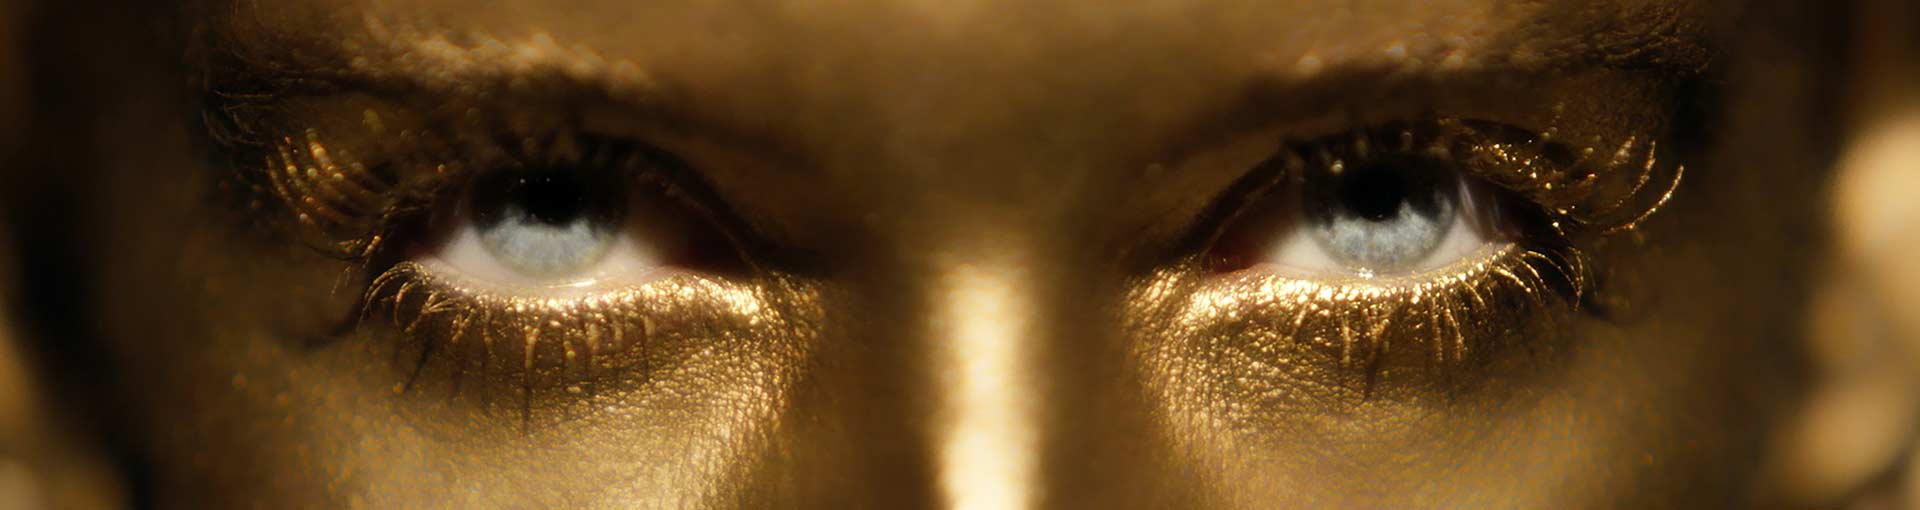 Gold face eyes